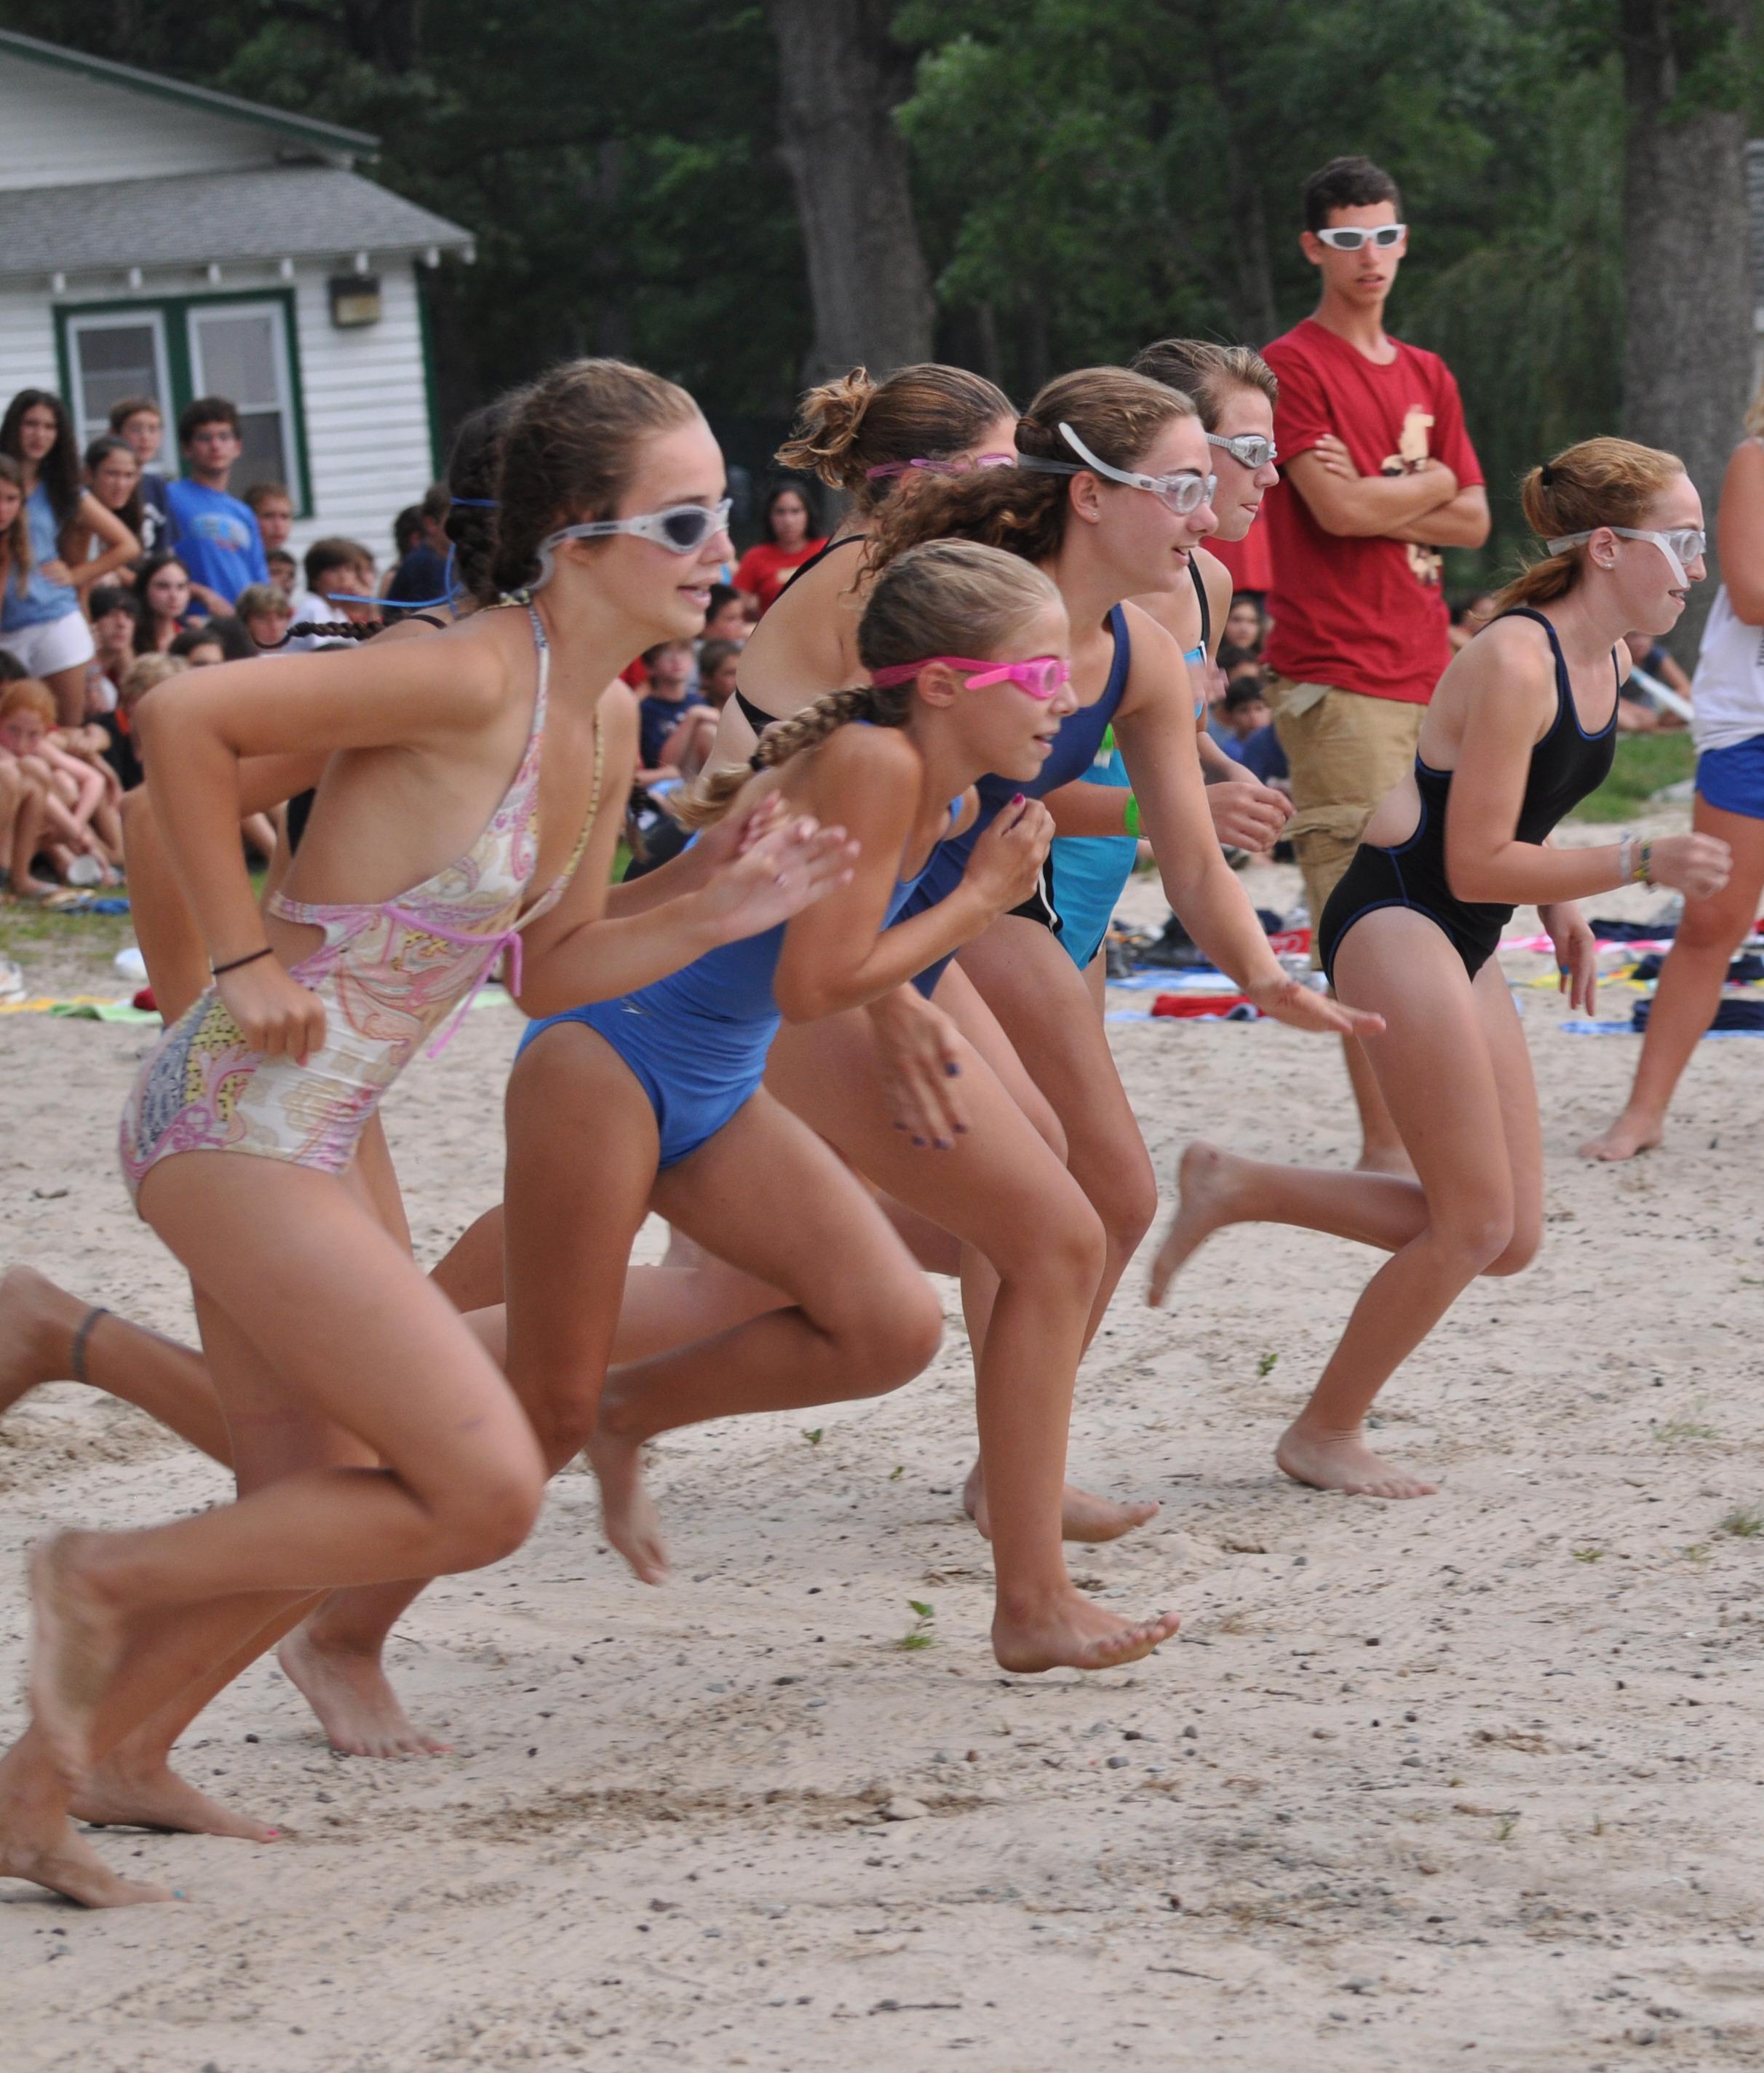 019f3ef9e15866b8db6f_12_Girls_running_on_beach_KR_2010_cropped.jpg